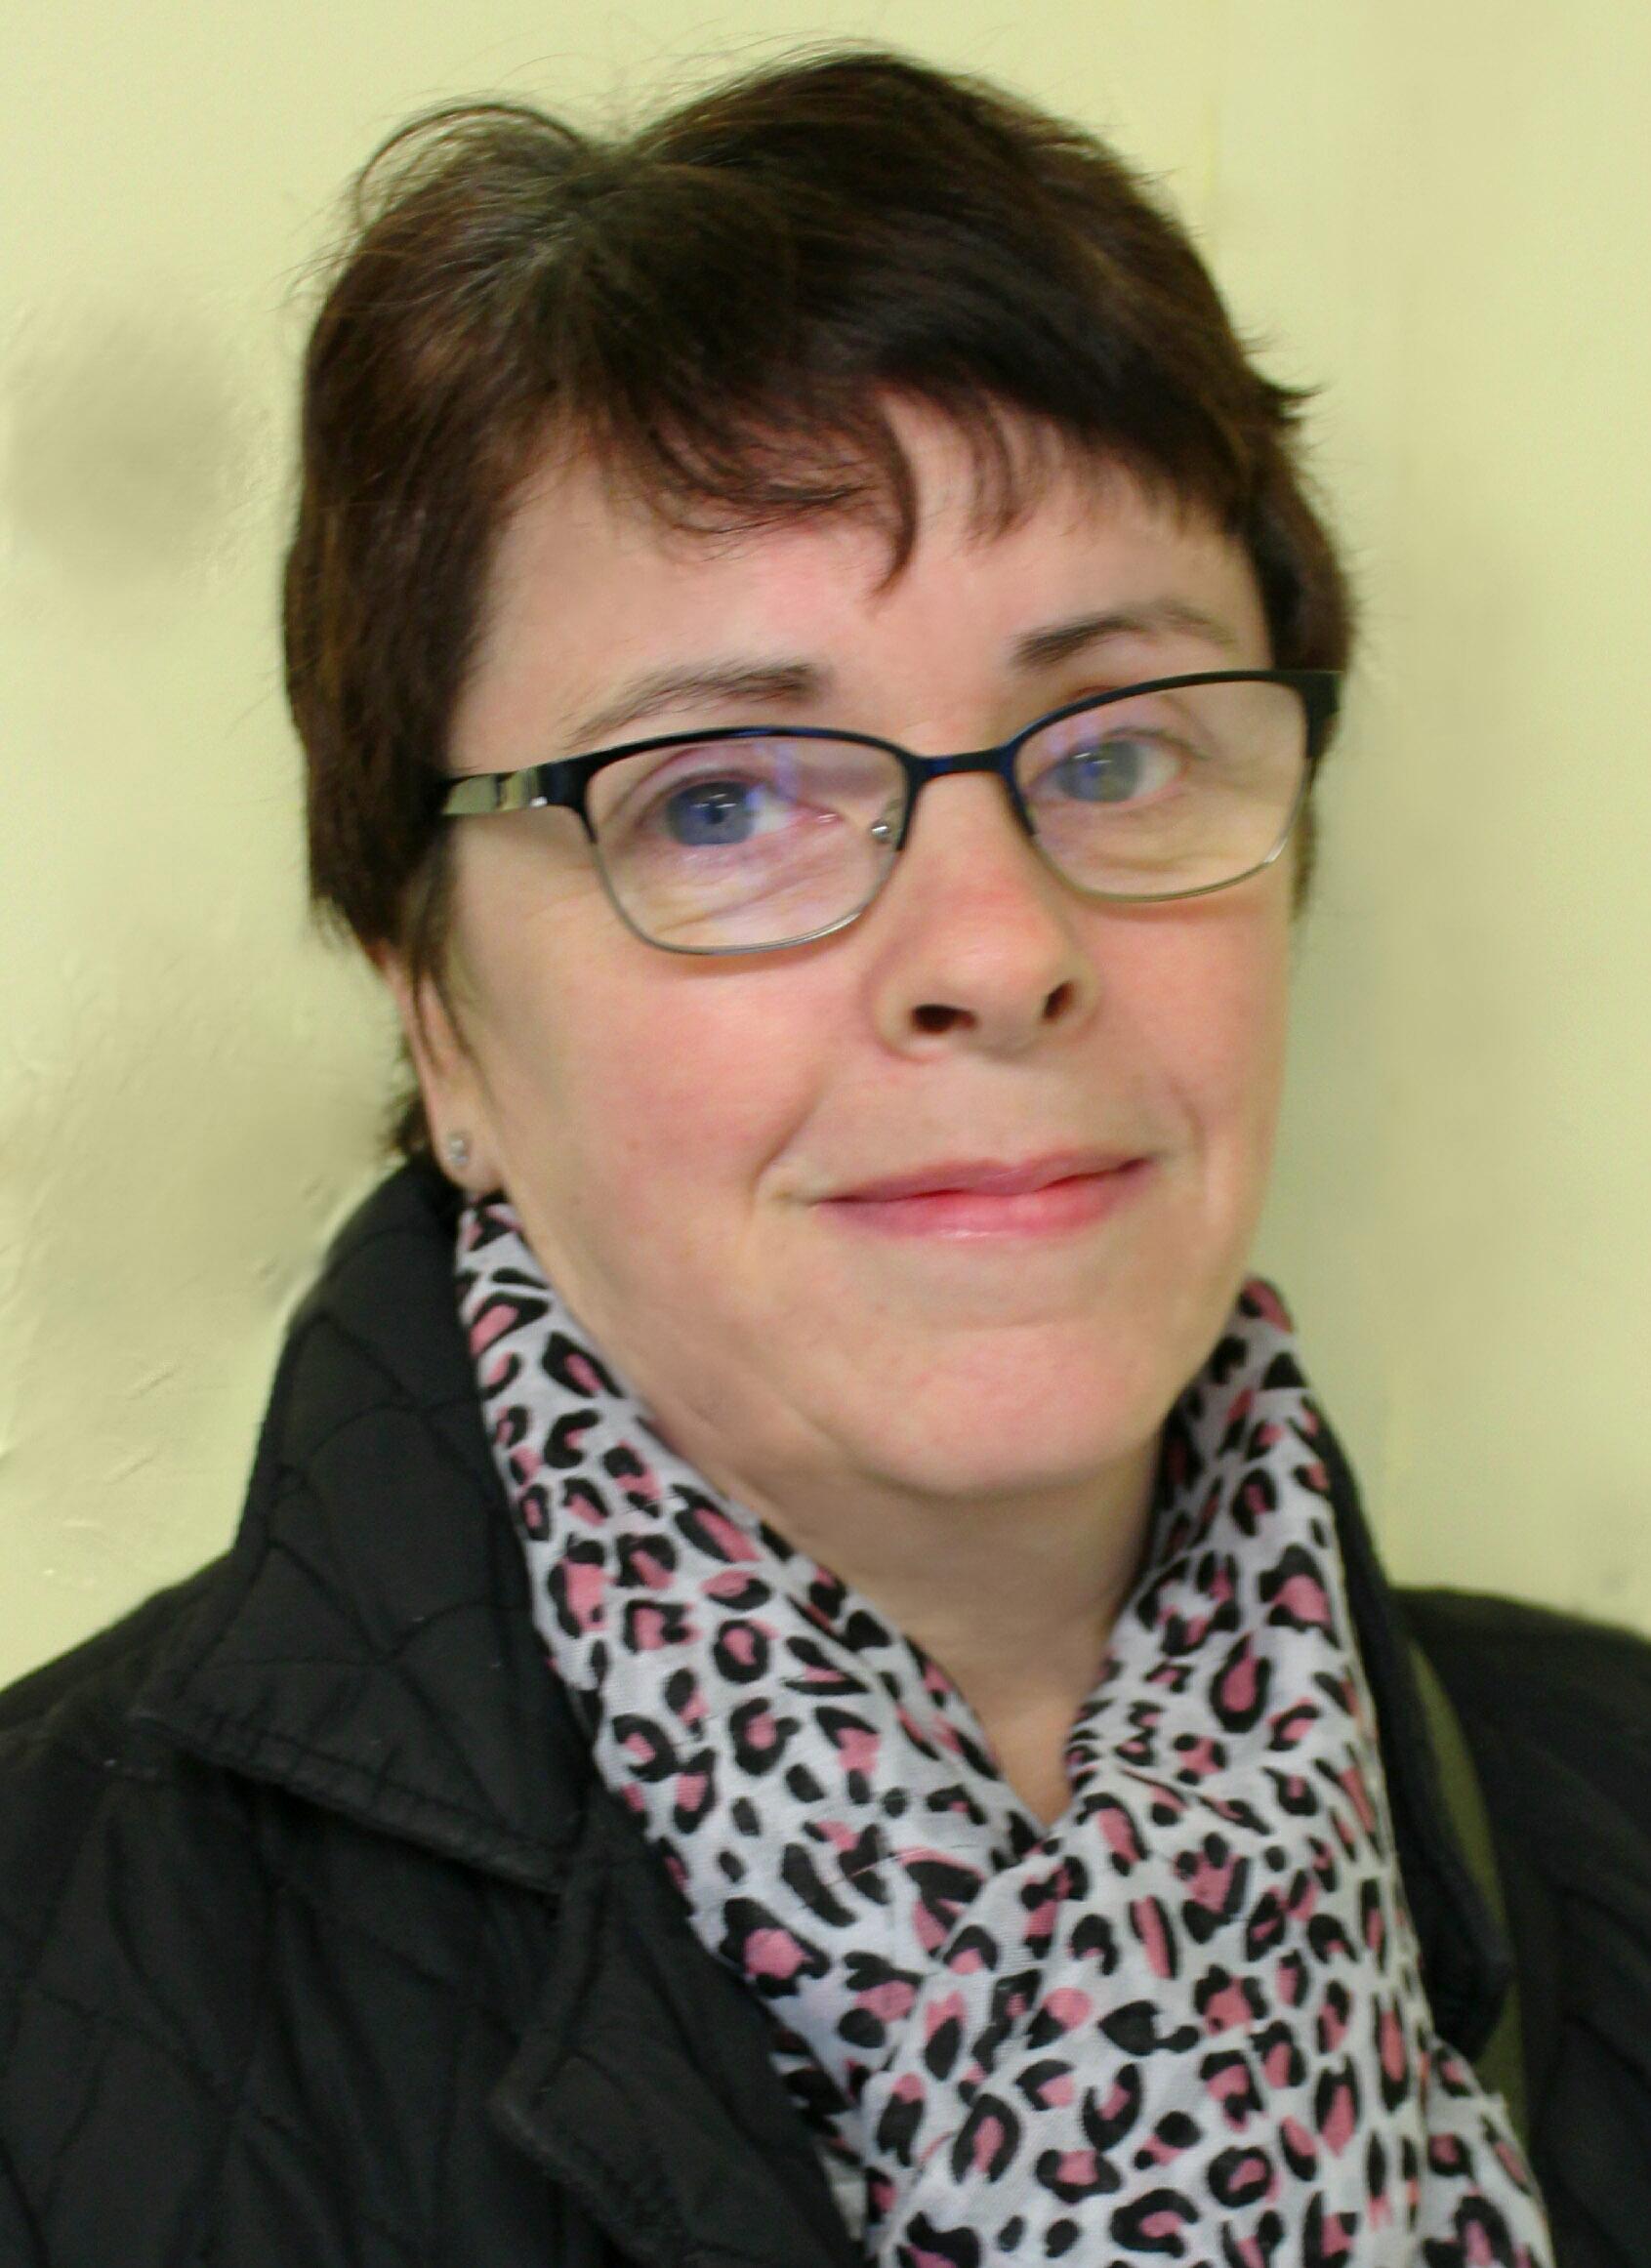 Teresa O'Driscoll Bus Escort